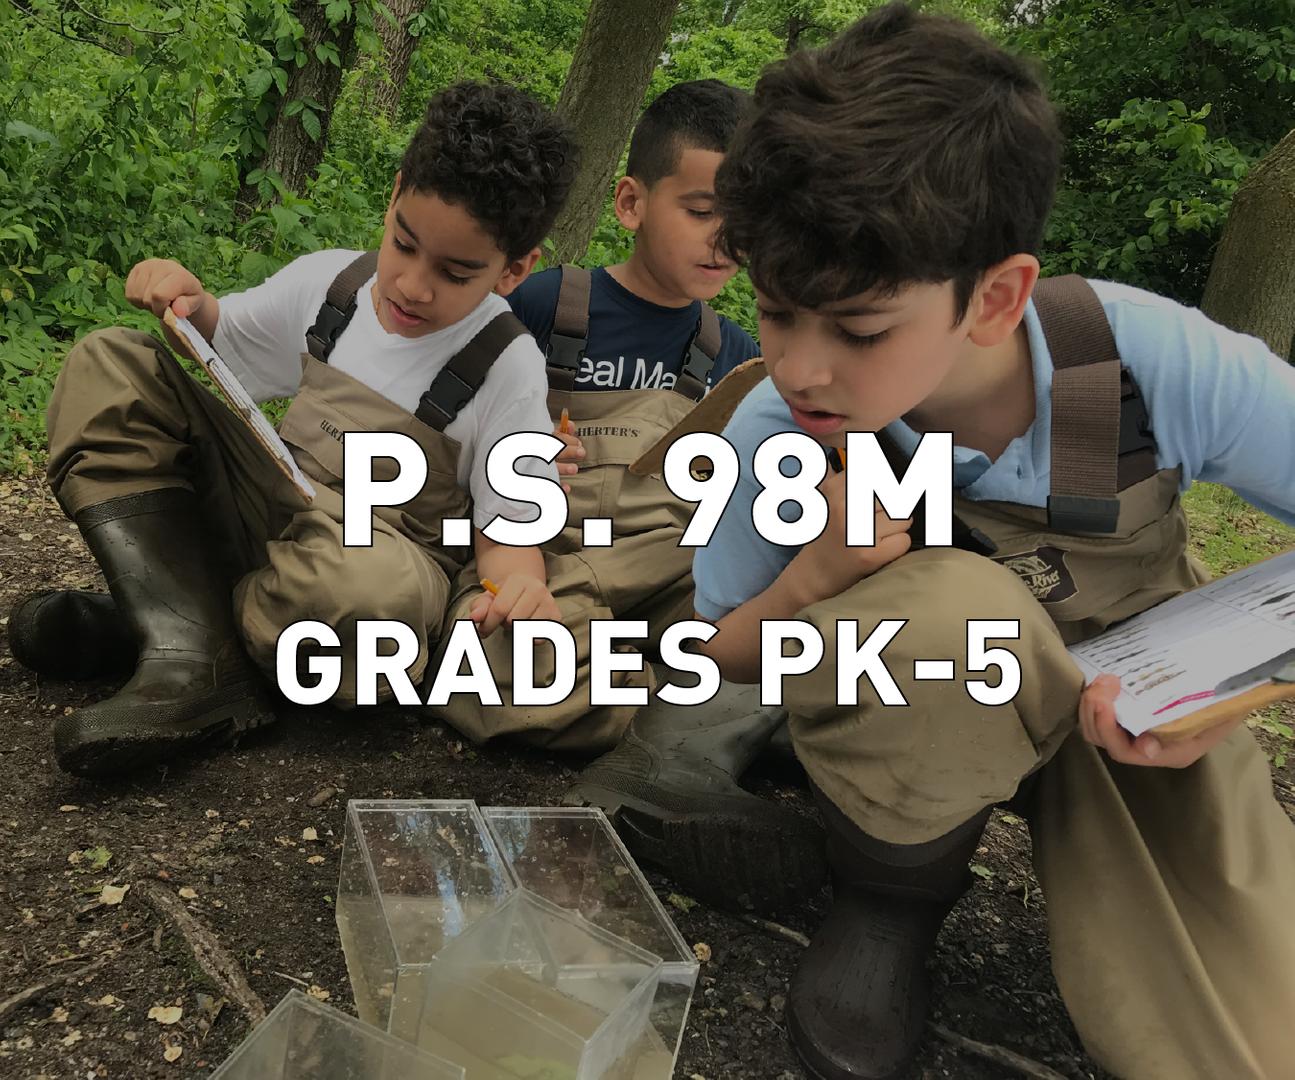 P.S. 98M Grades PK-5